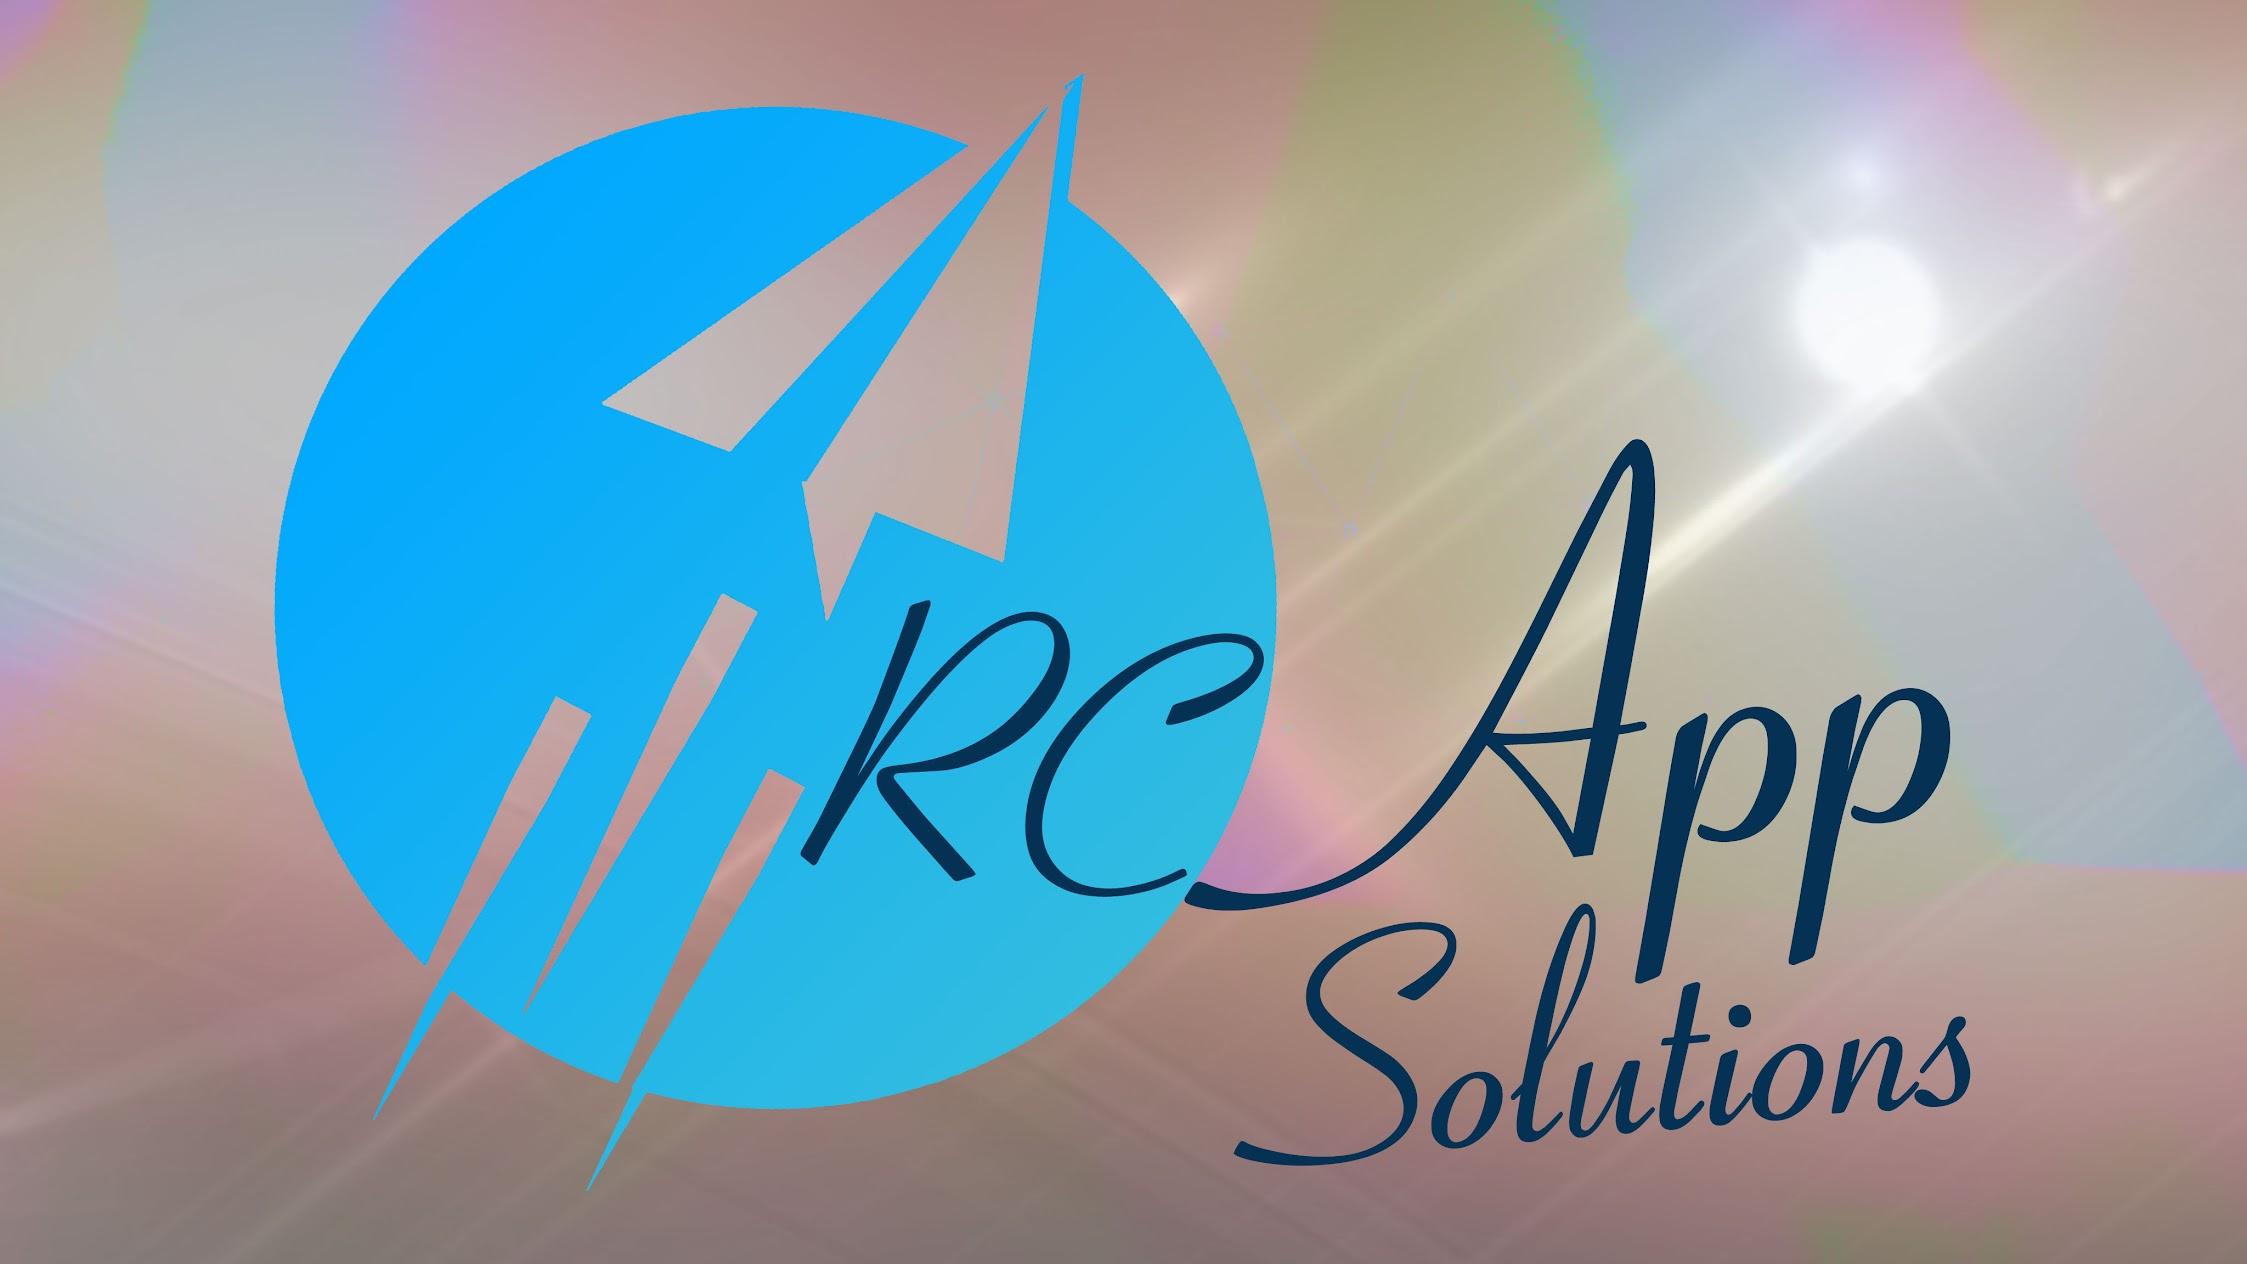 RC App Solutions